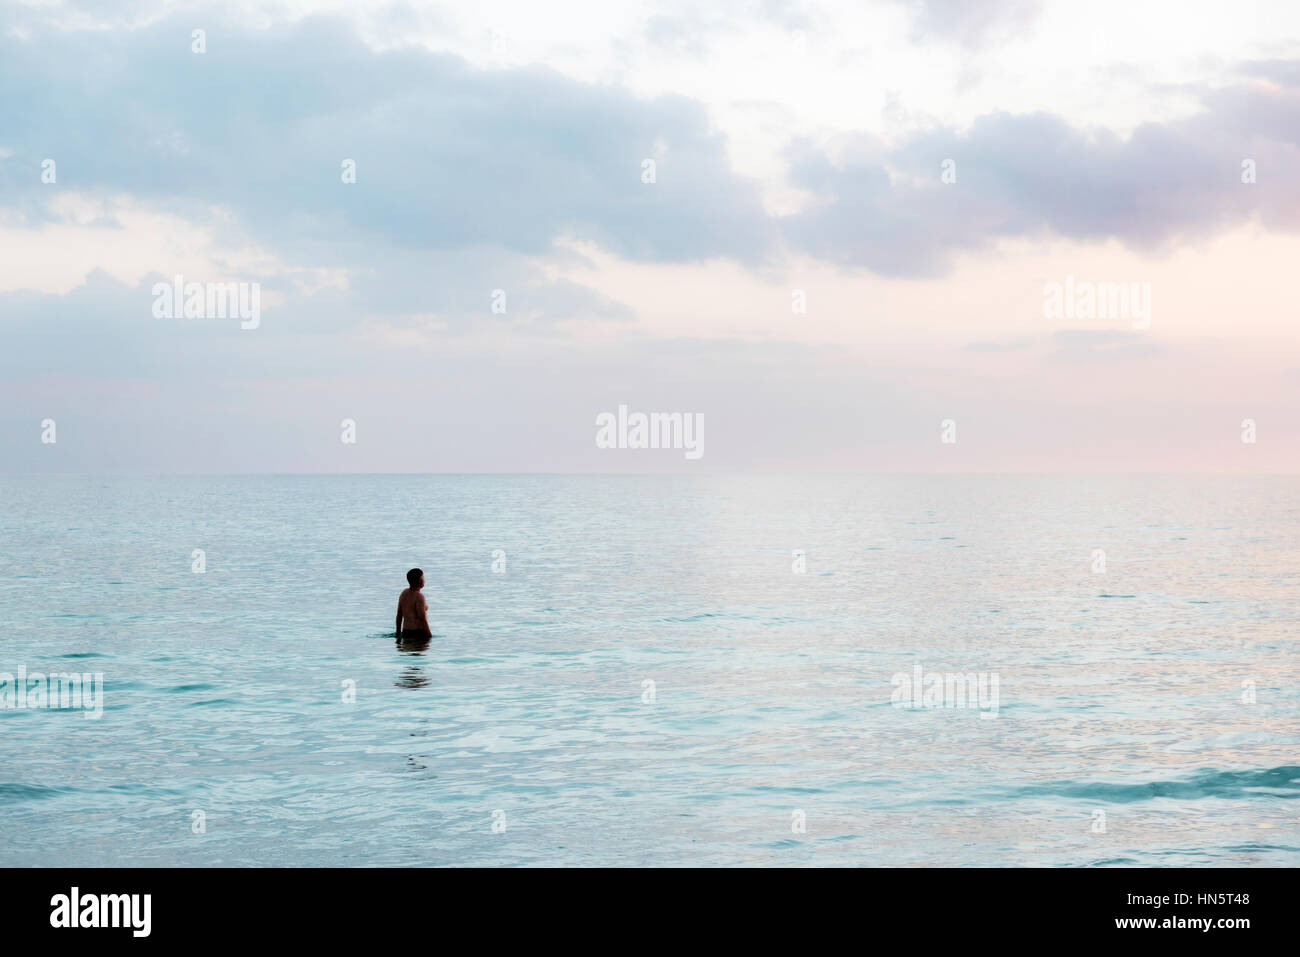 Solitary man in tropical ocean water, Siesta Key Beach, Florida, USA. - Stock Image